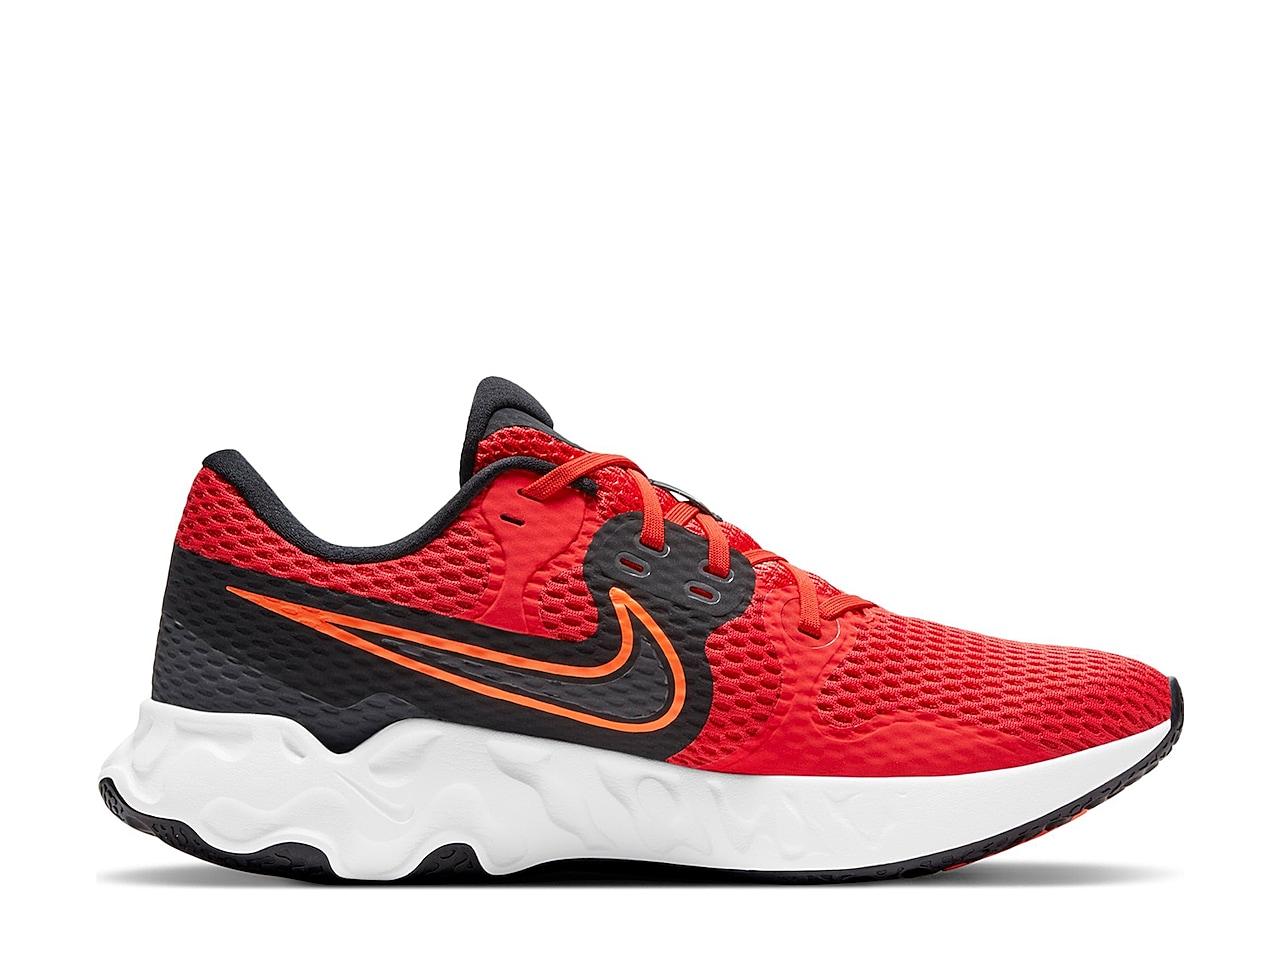 Nike Renew Ride 2 Running Shoe - Men's